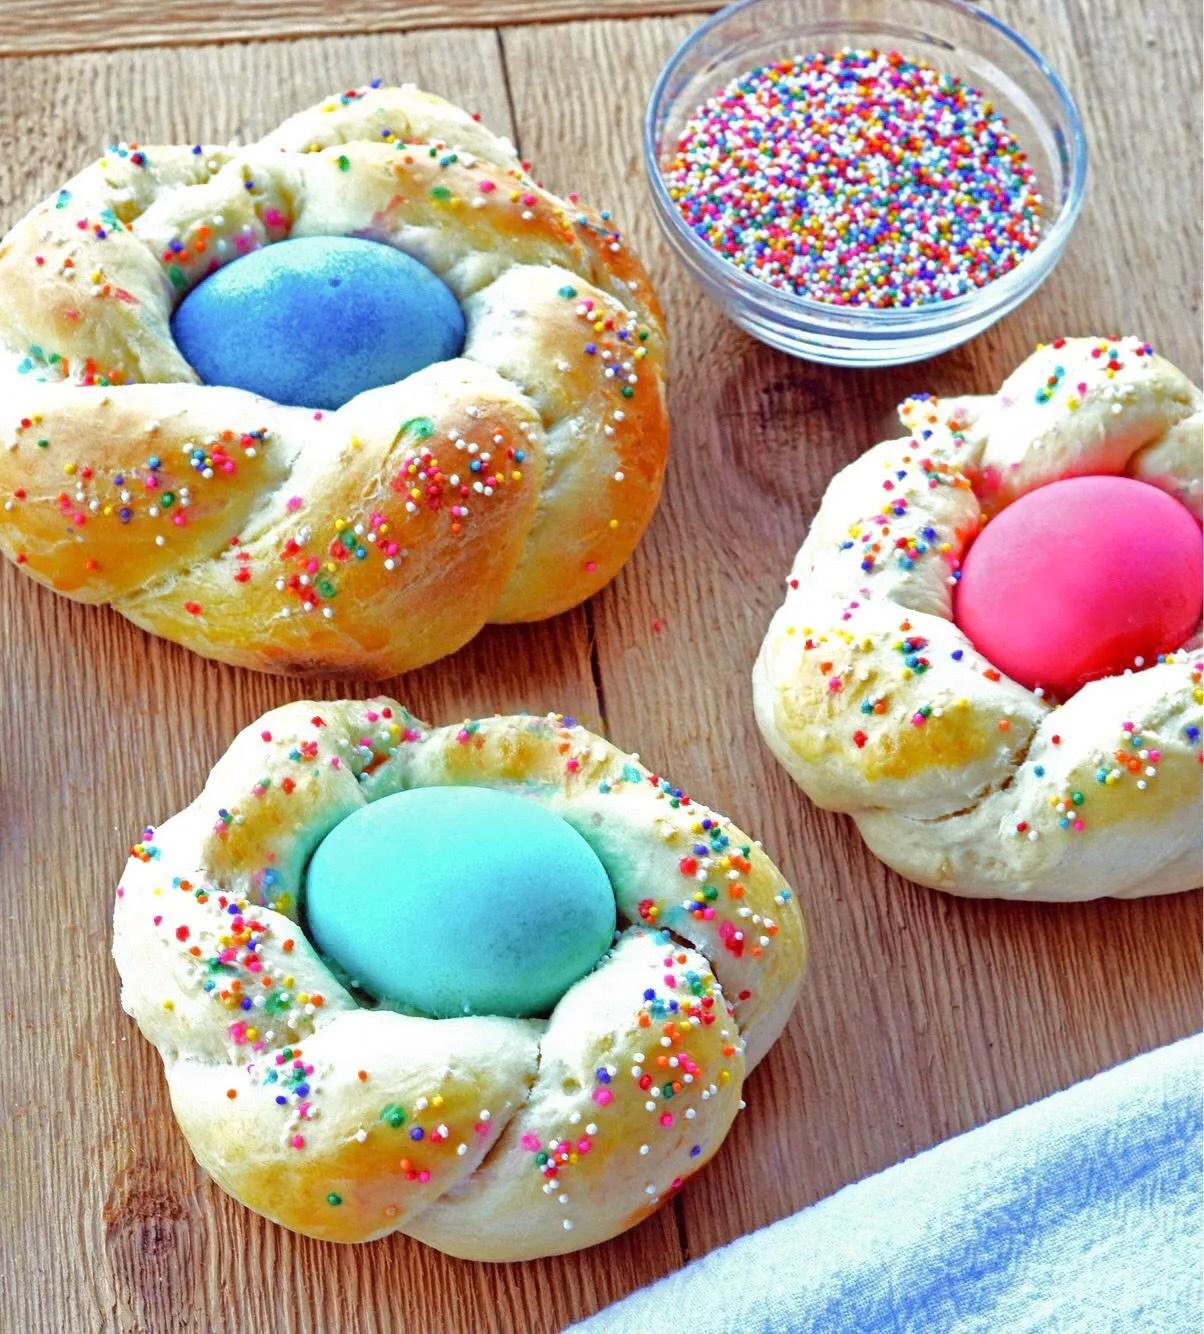 Italian Easter Egg Wreath Bread